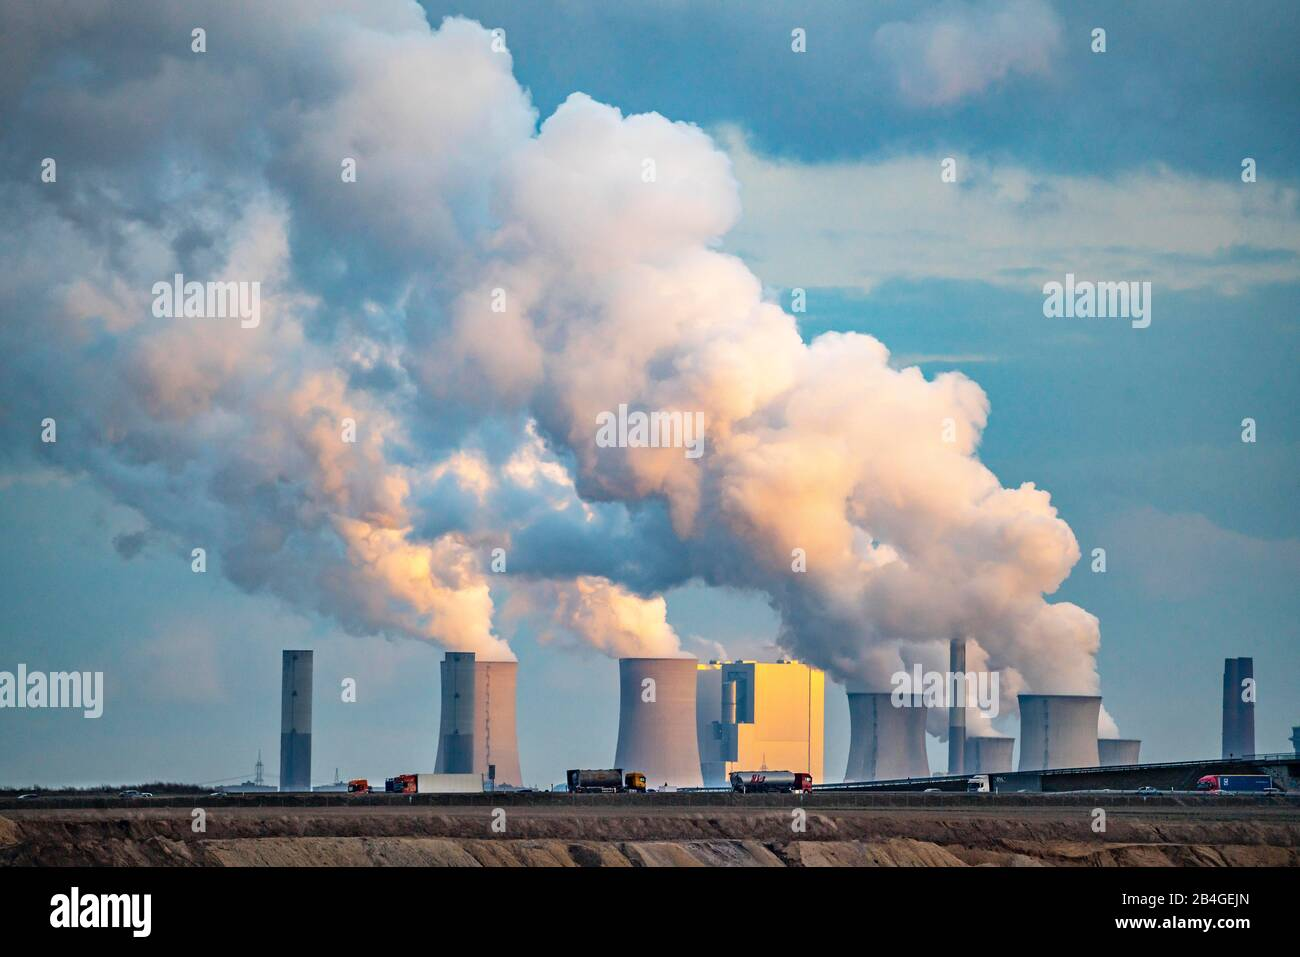 Lignite power plant Neurath, near Grevenbroich, motorway A44, Germany, Stock Photo